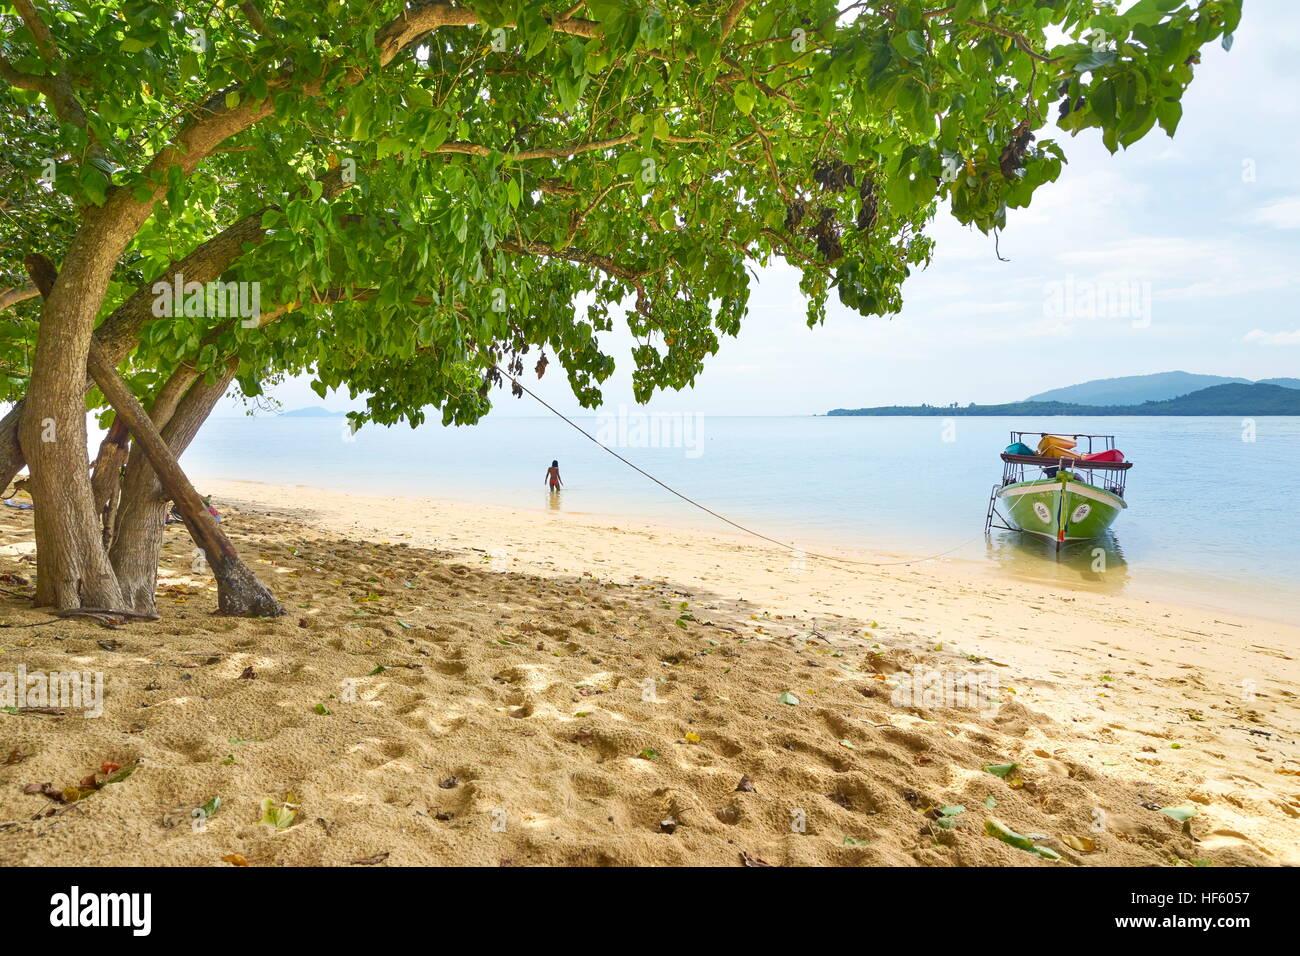 Sandy Beach at Bu Bu Island, Krabi Province, Thailand - Stock Image